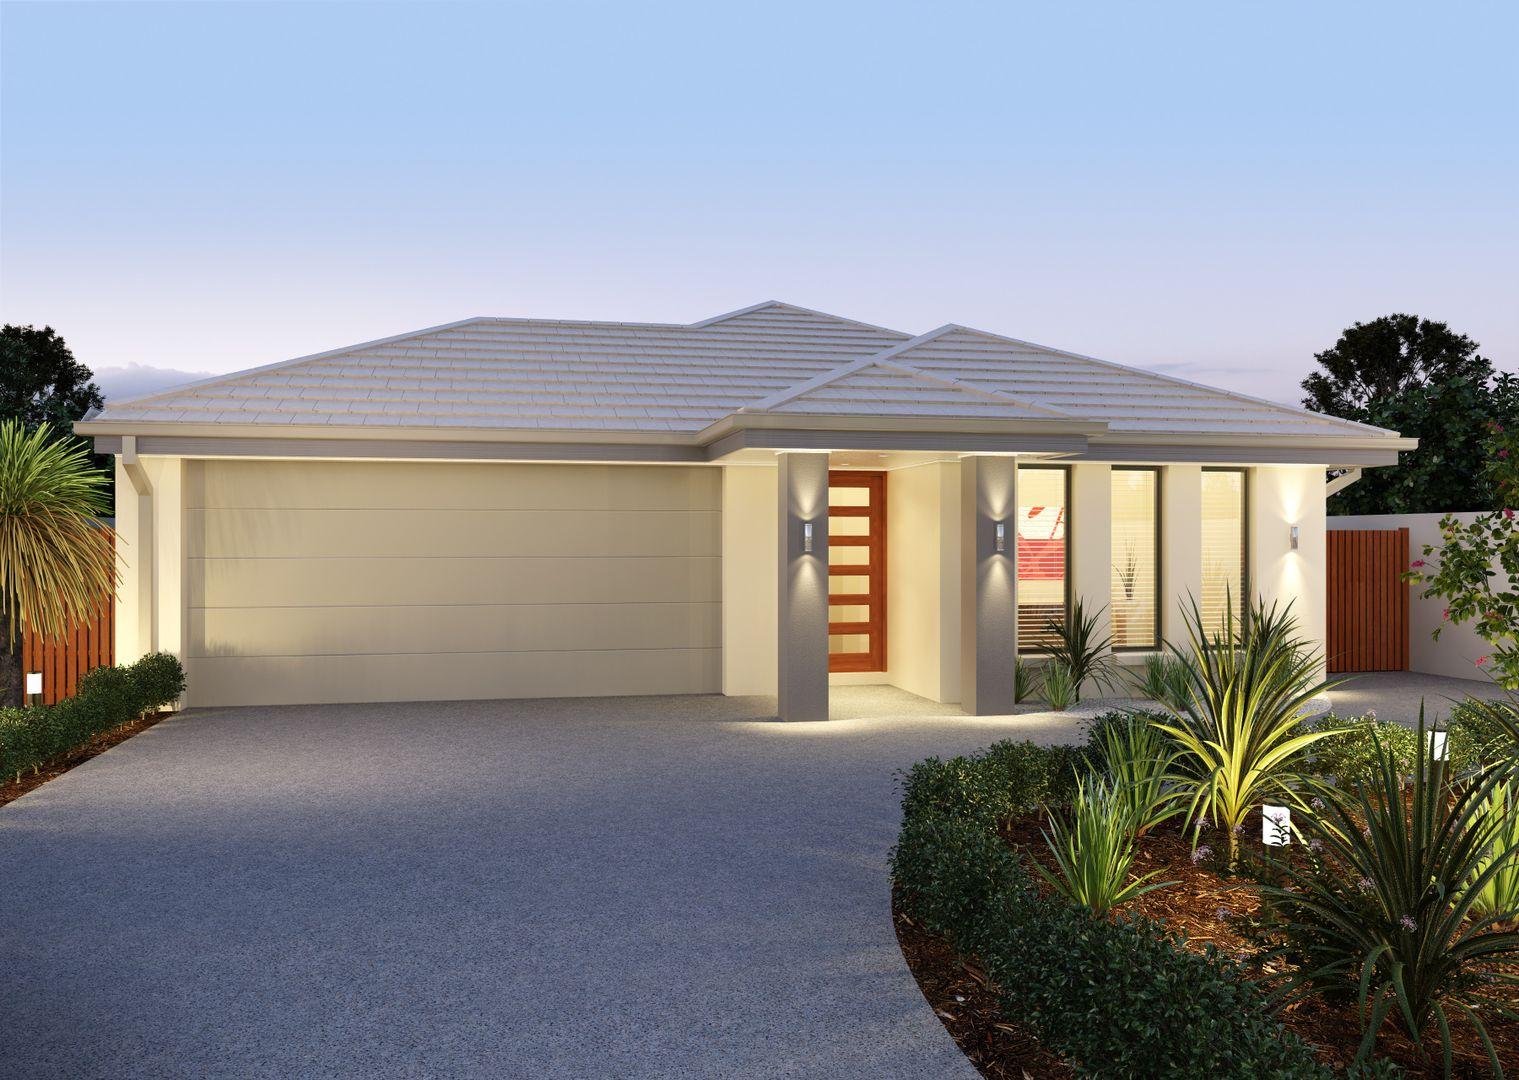 Lot 152 New Road, Ridge View Estate, Narangba QLD 4504, Image 0